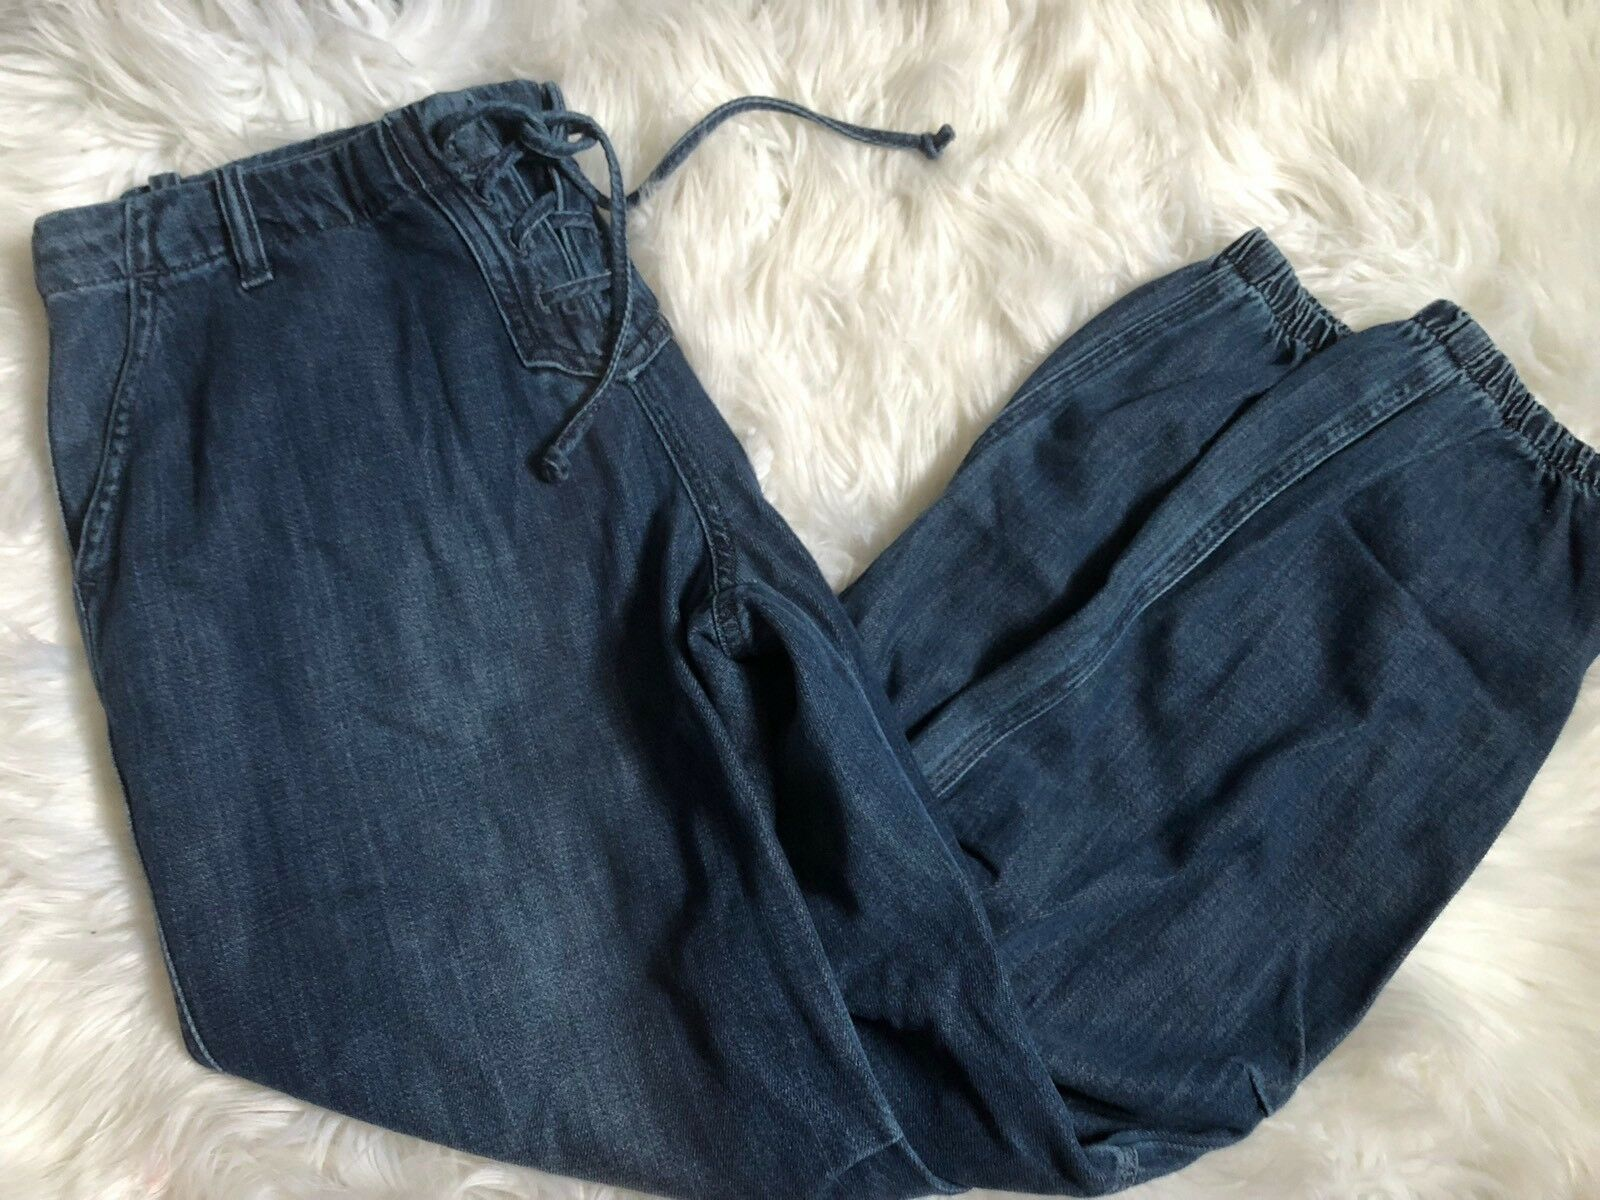 NEW CLOTH STONE Sz M LACE UP JOGGER PANT In blueE DENIM MEDIUM